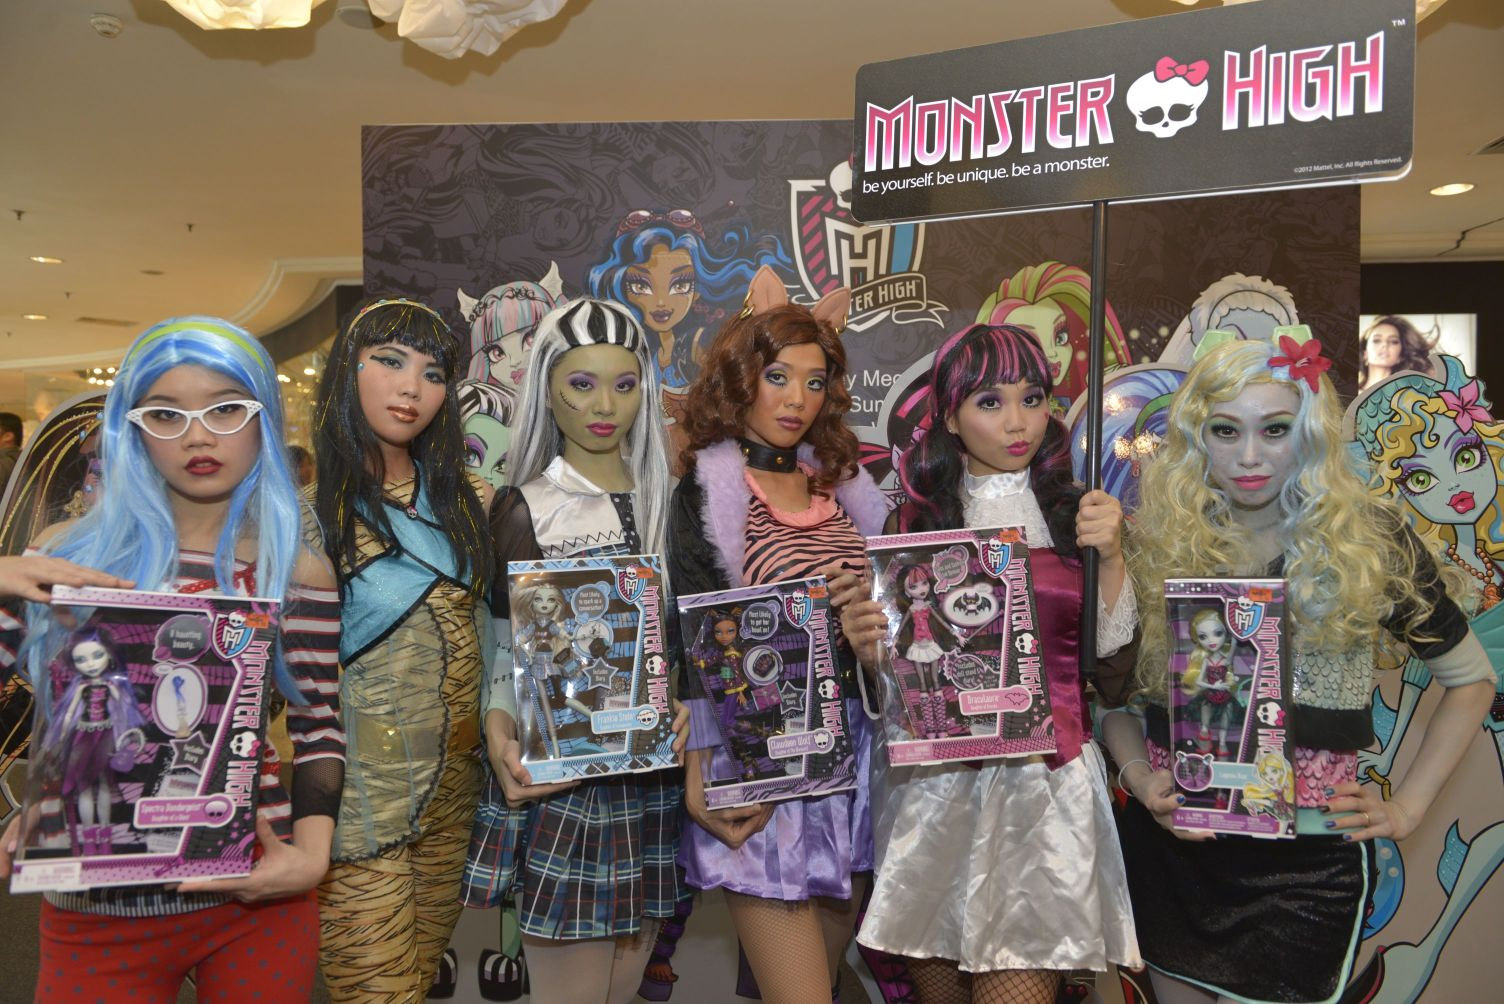 Just Norahs: Launch of Mattel's Monster High Fashion Line